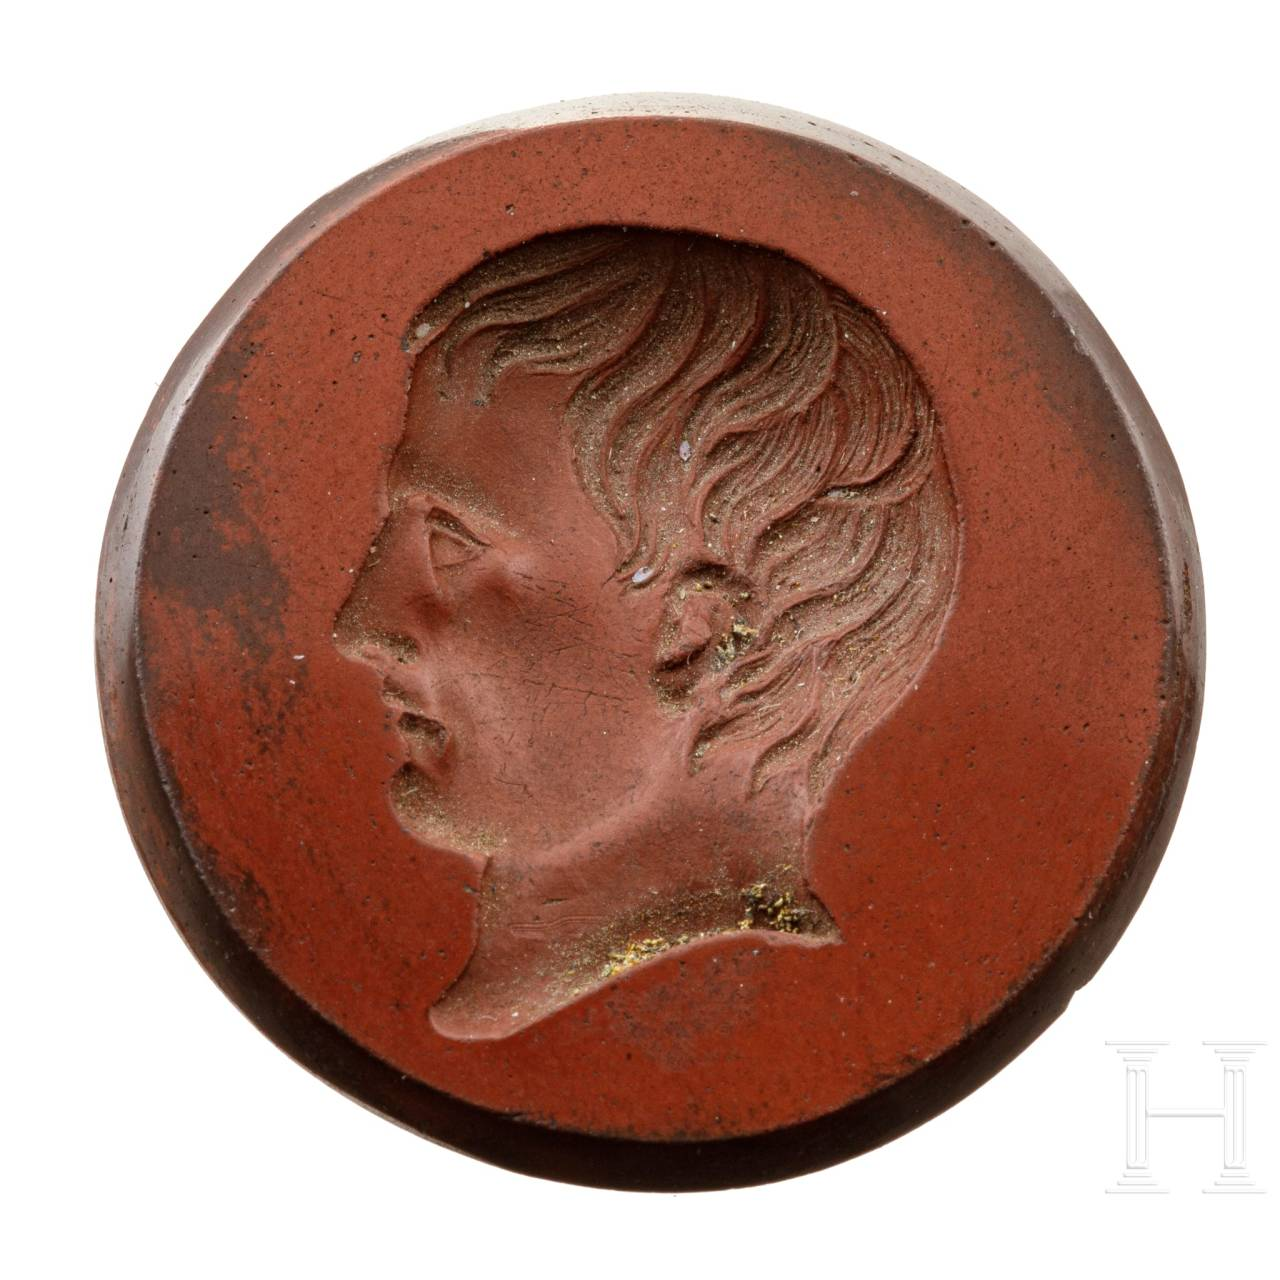 A gem stone with the profile of Napoleon Bonaparte, 19th century